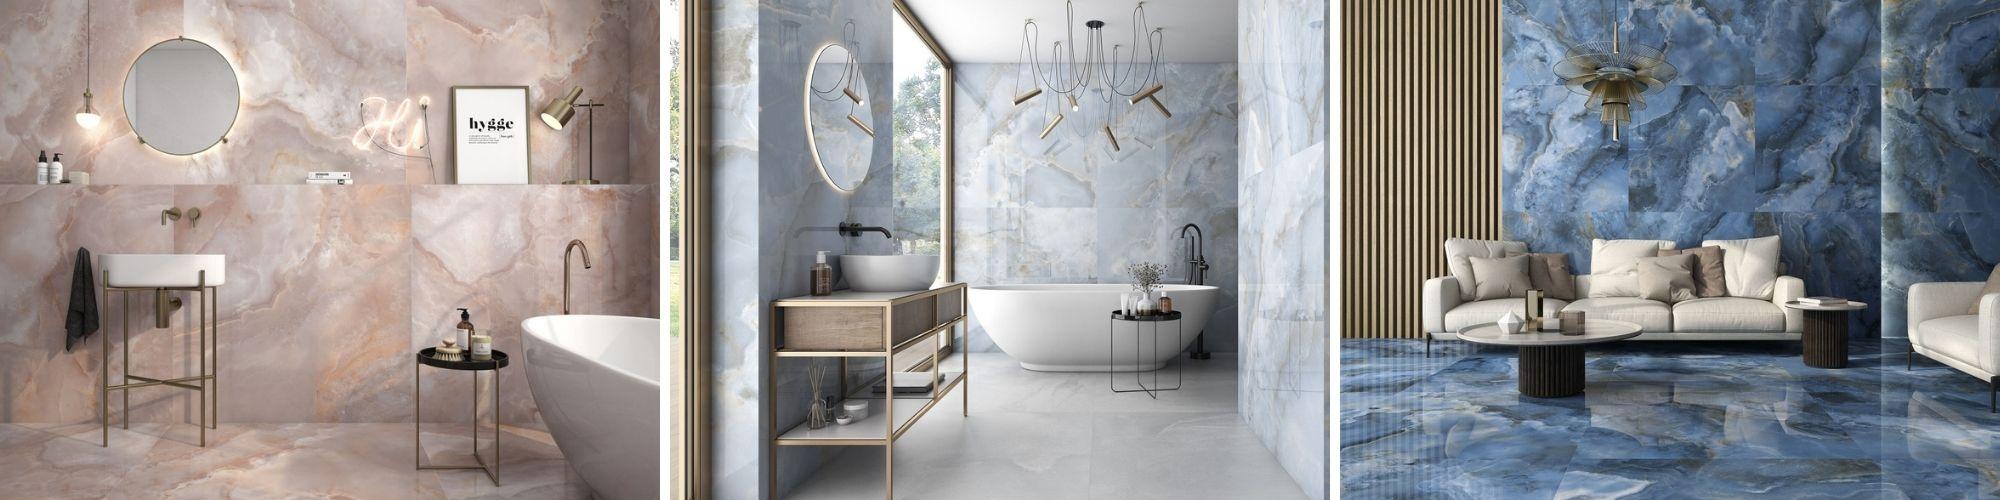 onix_marmor_design_pearl_rosa_rosenquarz_coral_blau_blue_badezimmer_kueche_wohnzimmer